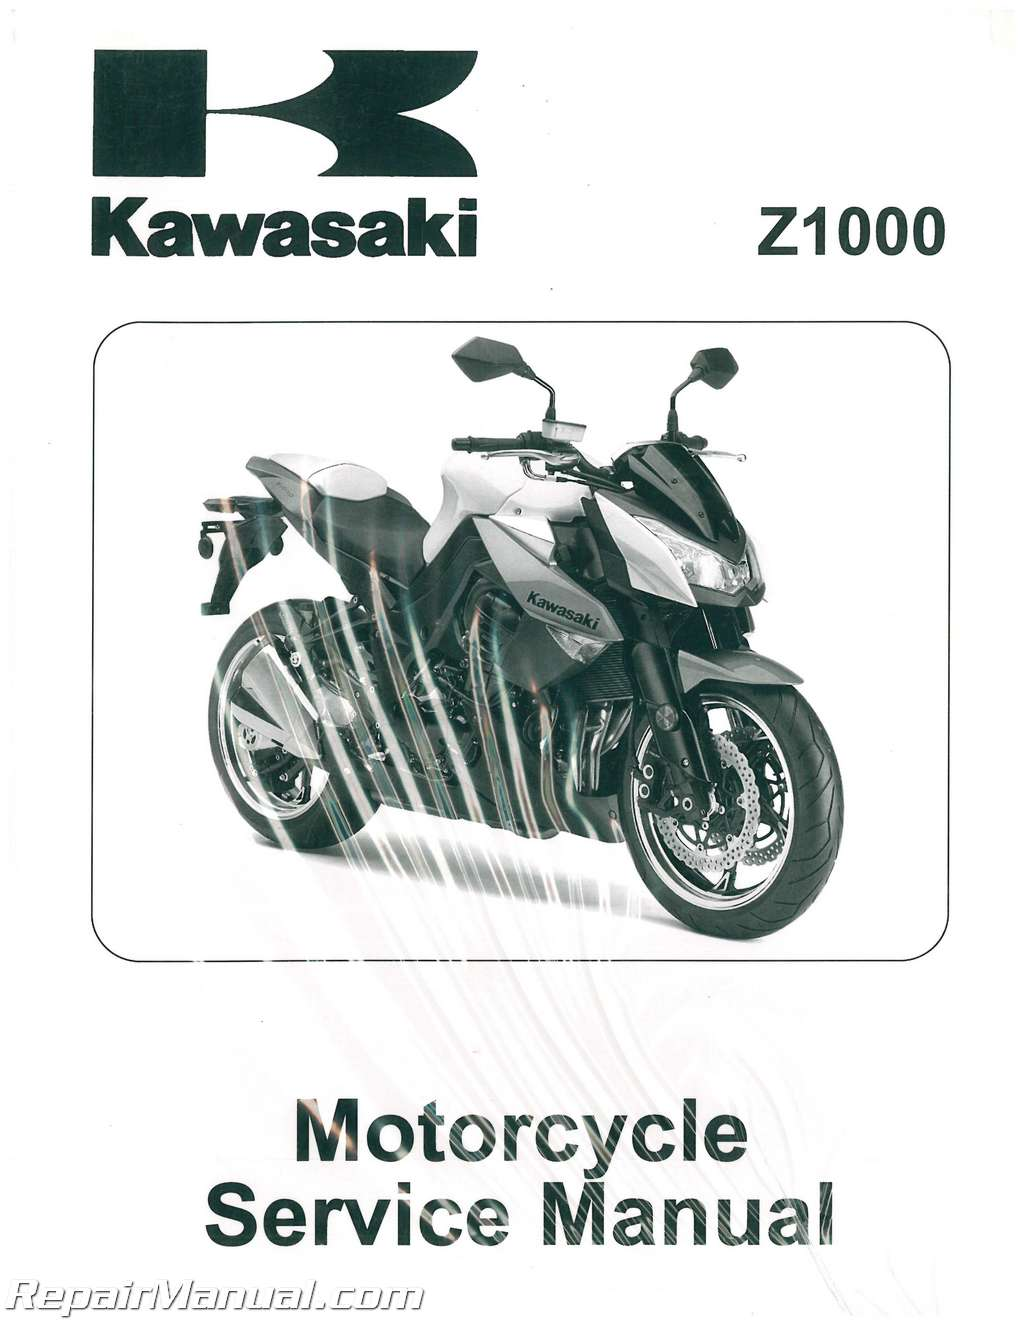 2010 Z1000 Kawasaki ZR1000D Motorcycle Service Manual